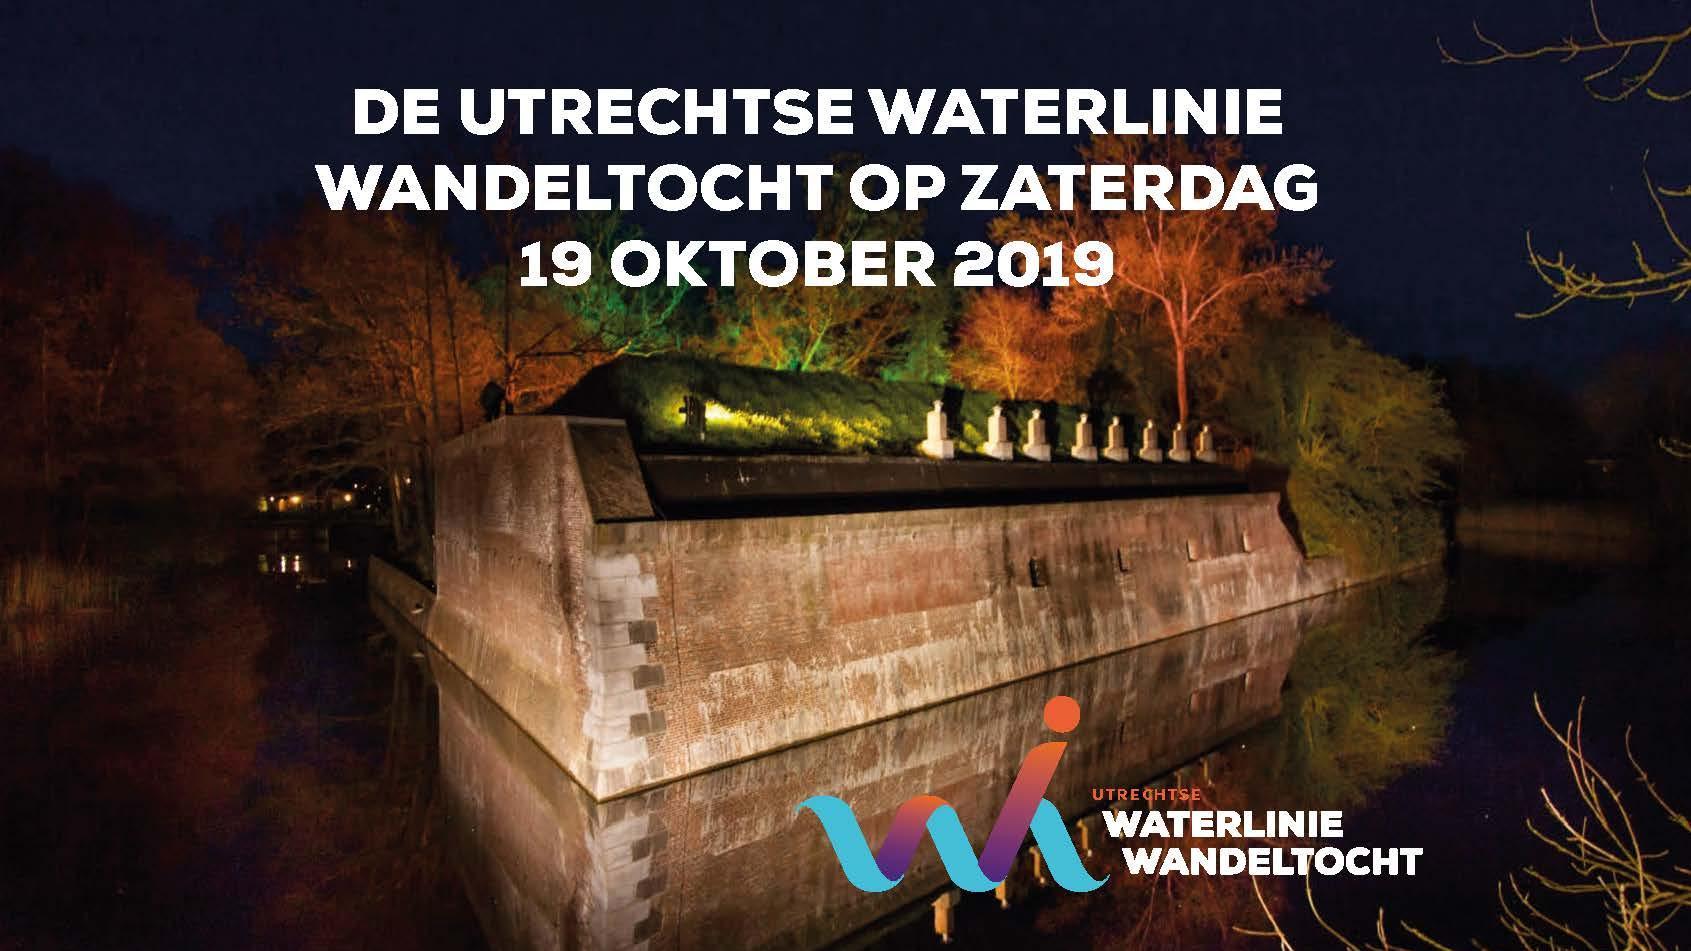 Waterlinie Wandeltocht